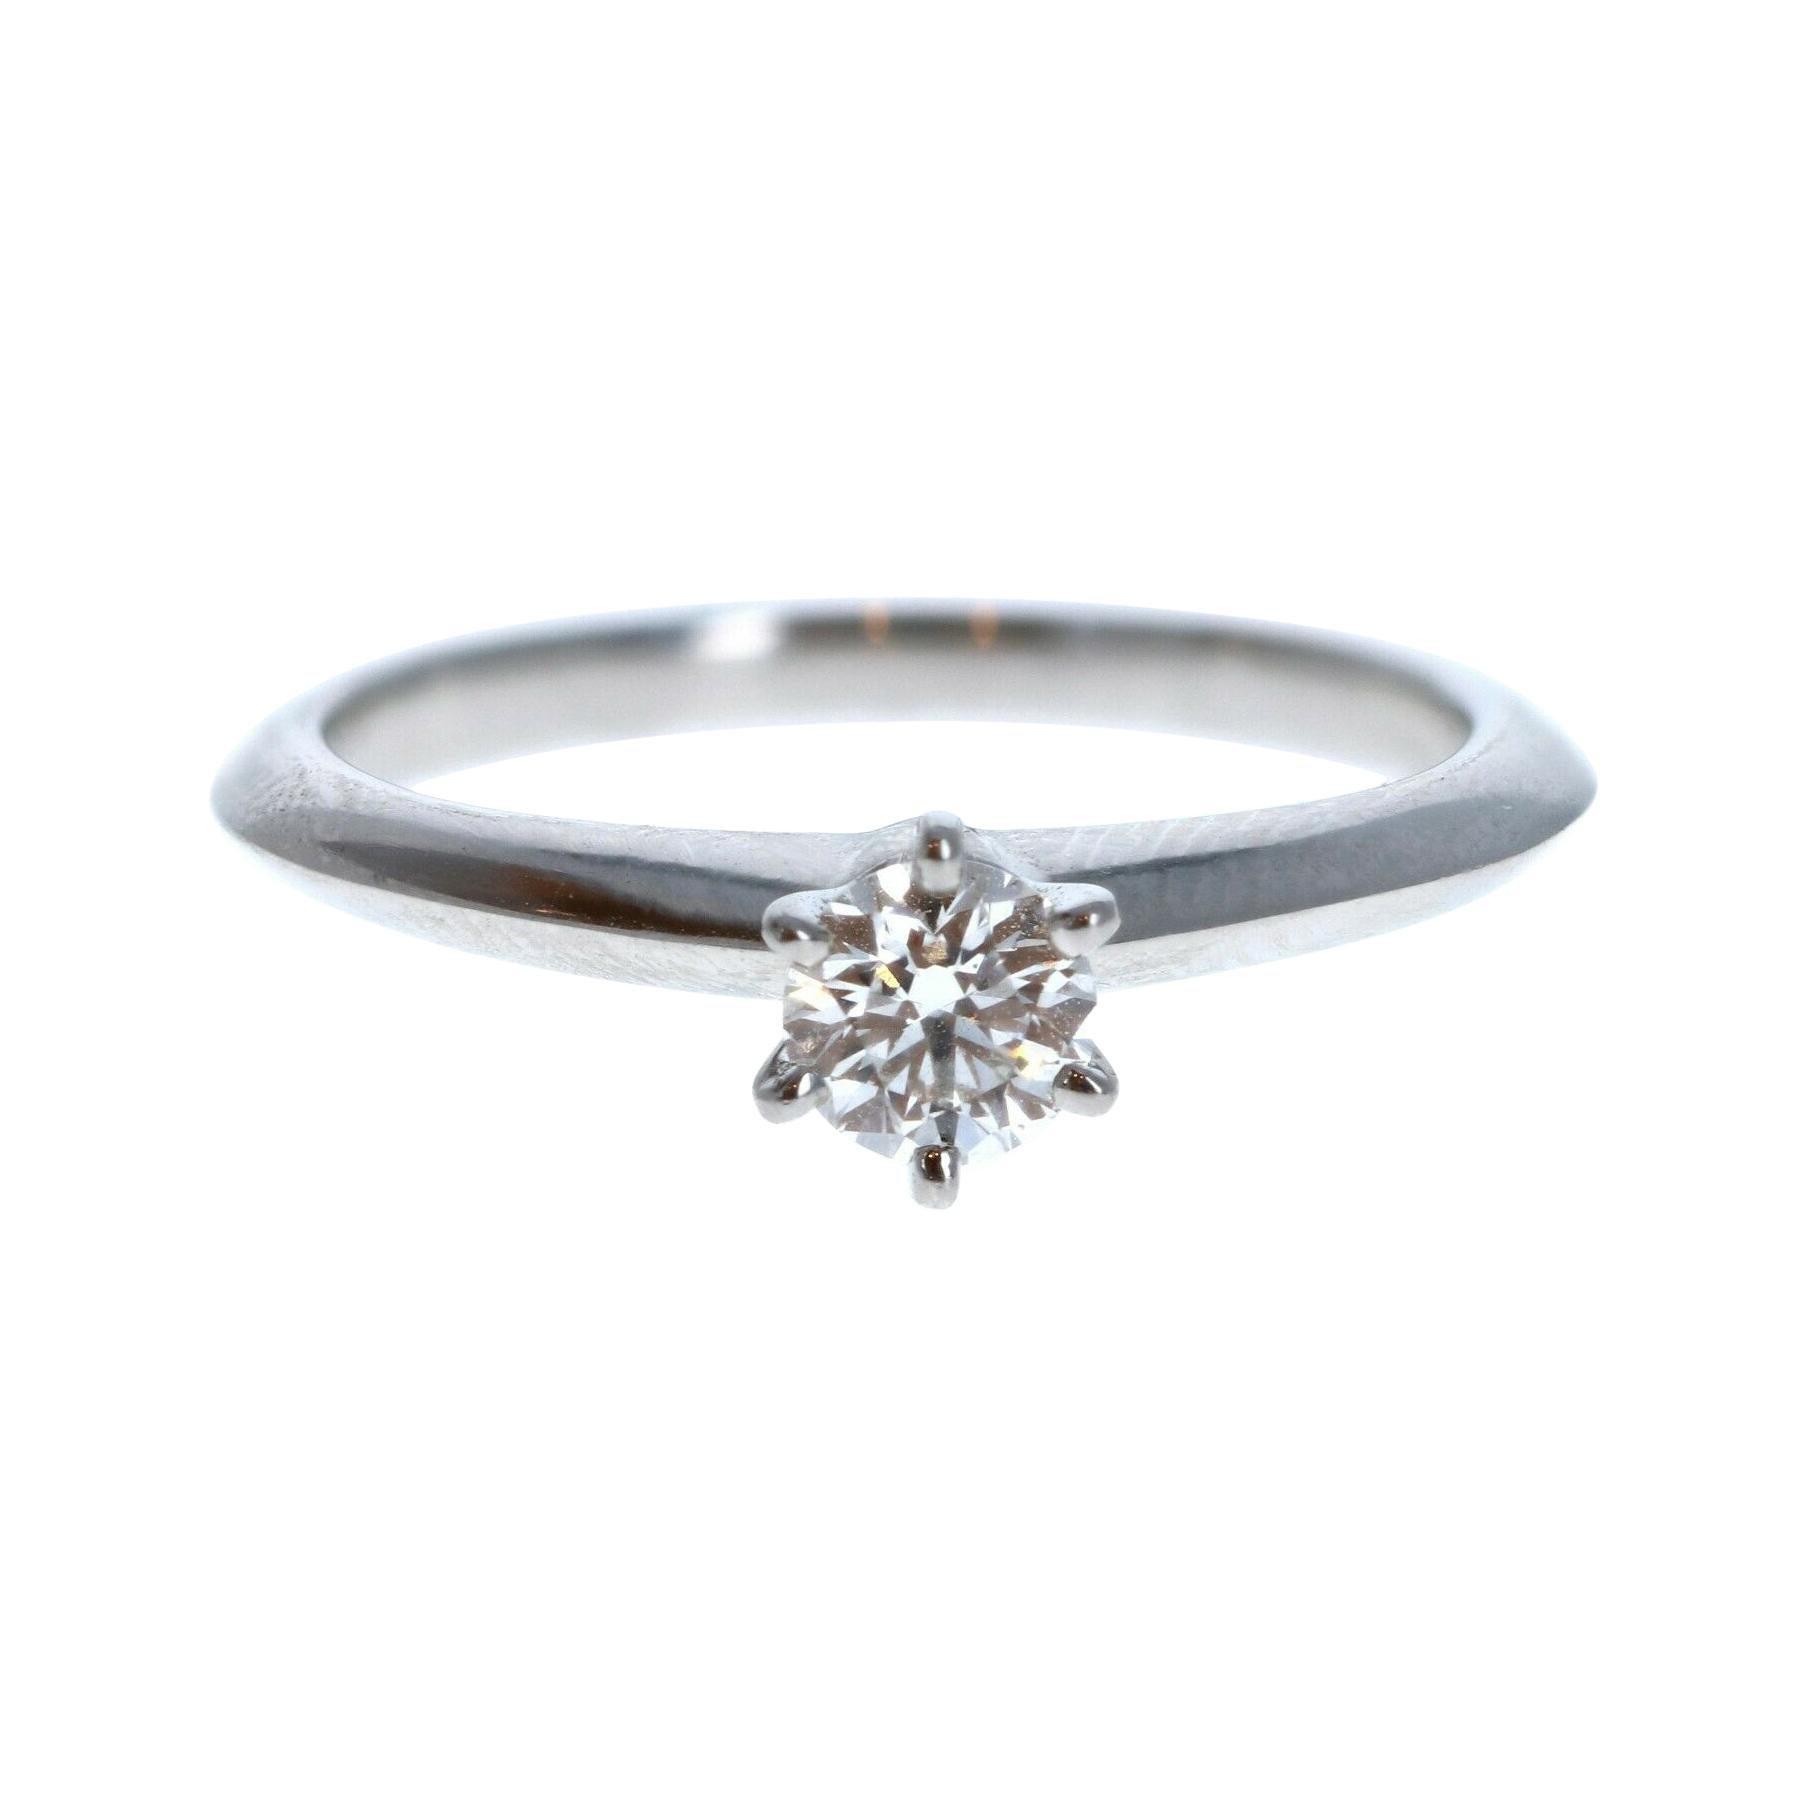 Tiffany & Co. Platinum & Diamond Solitaire Ring 0.26ctw